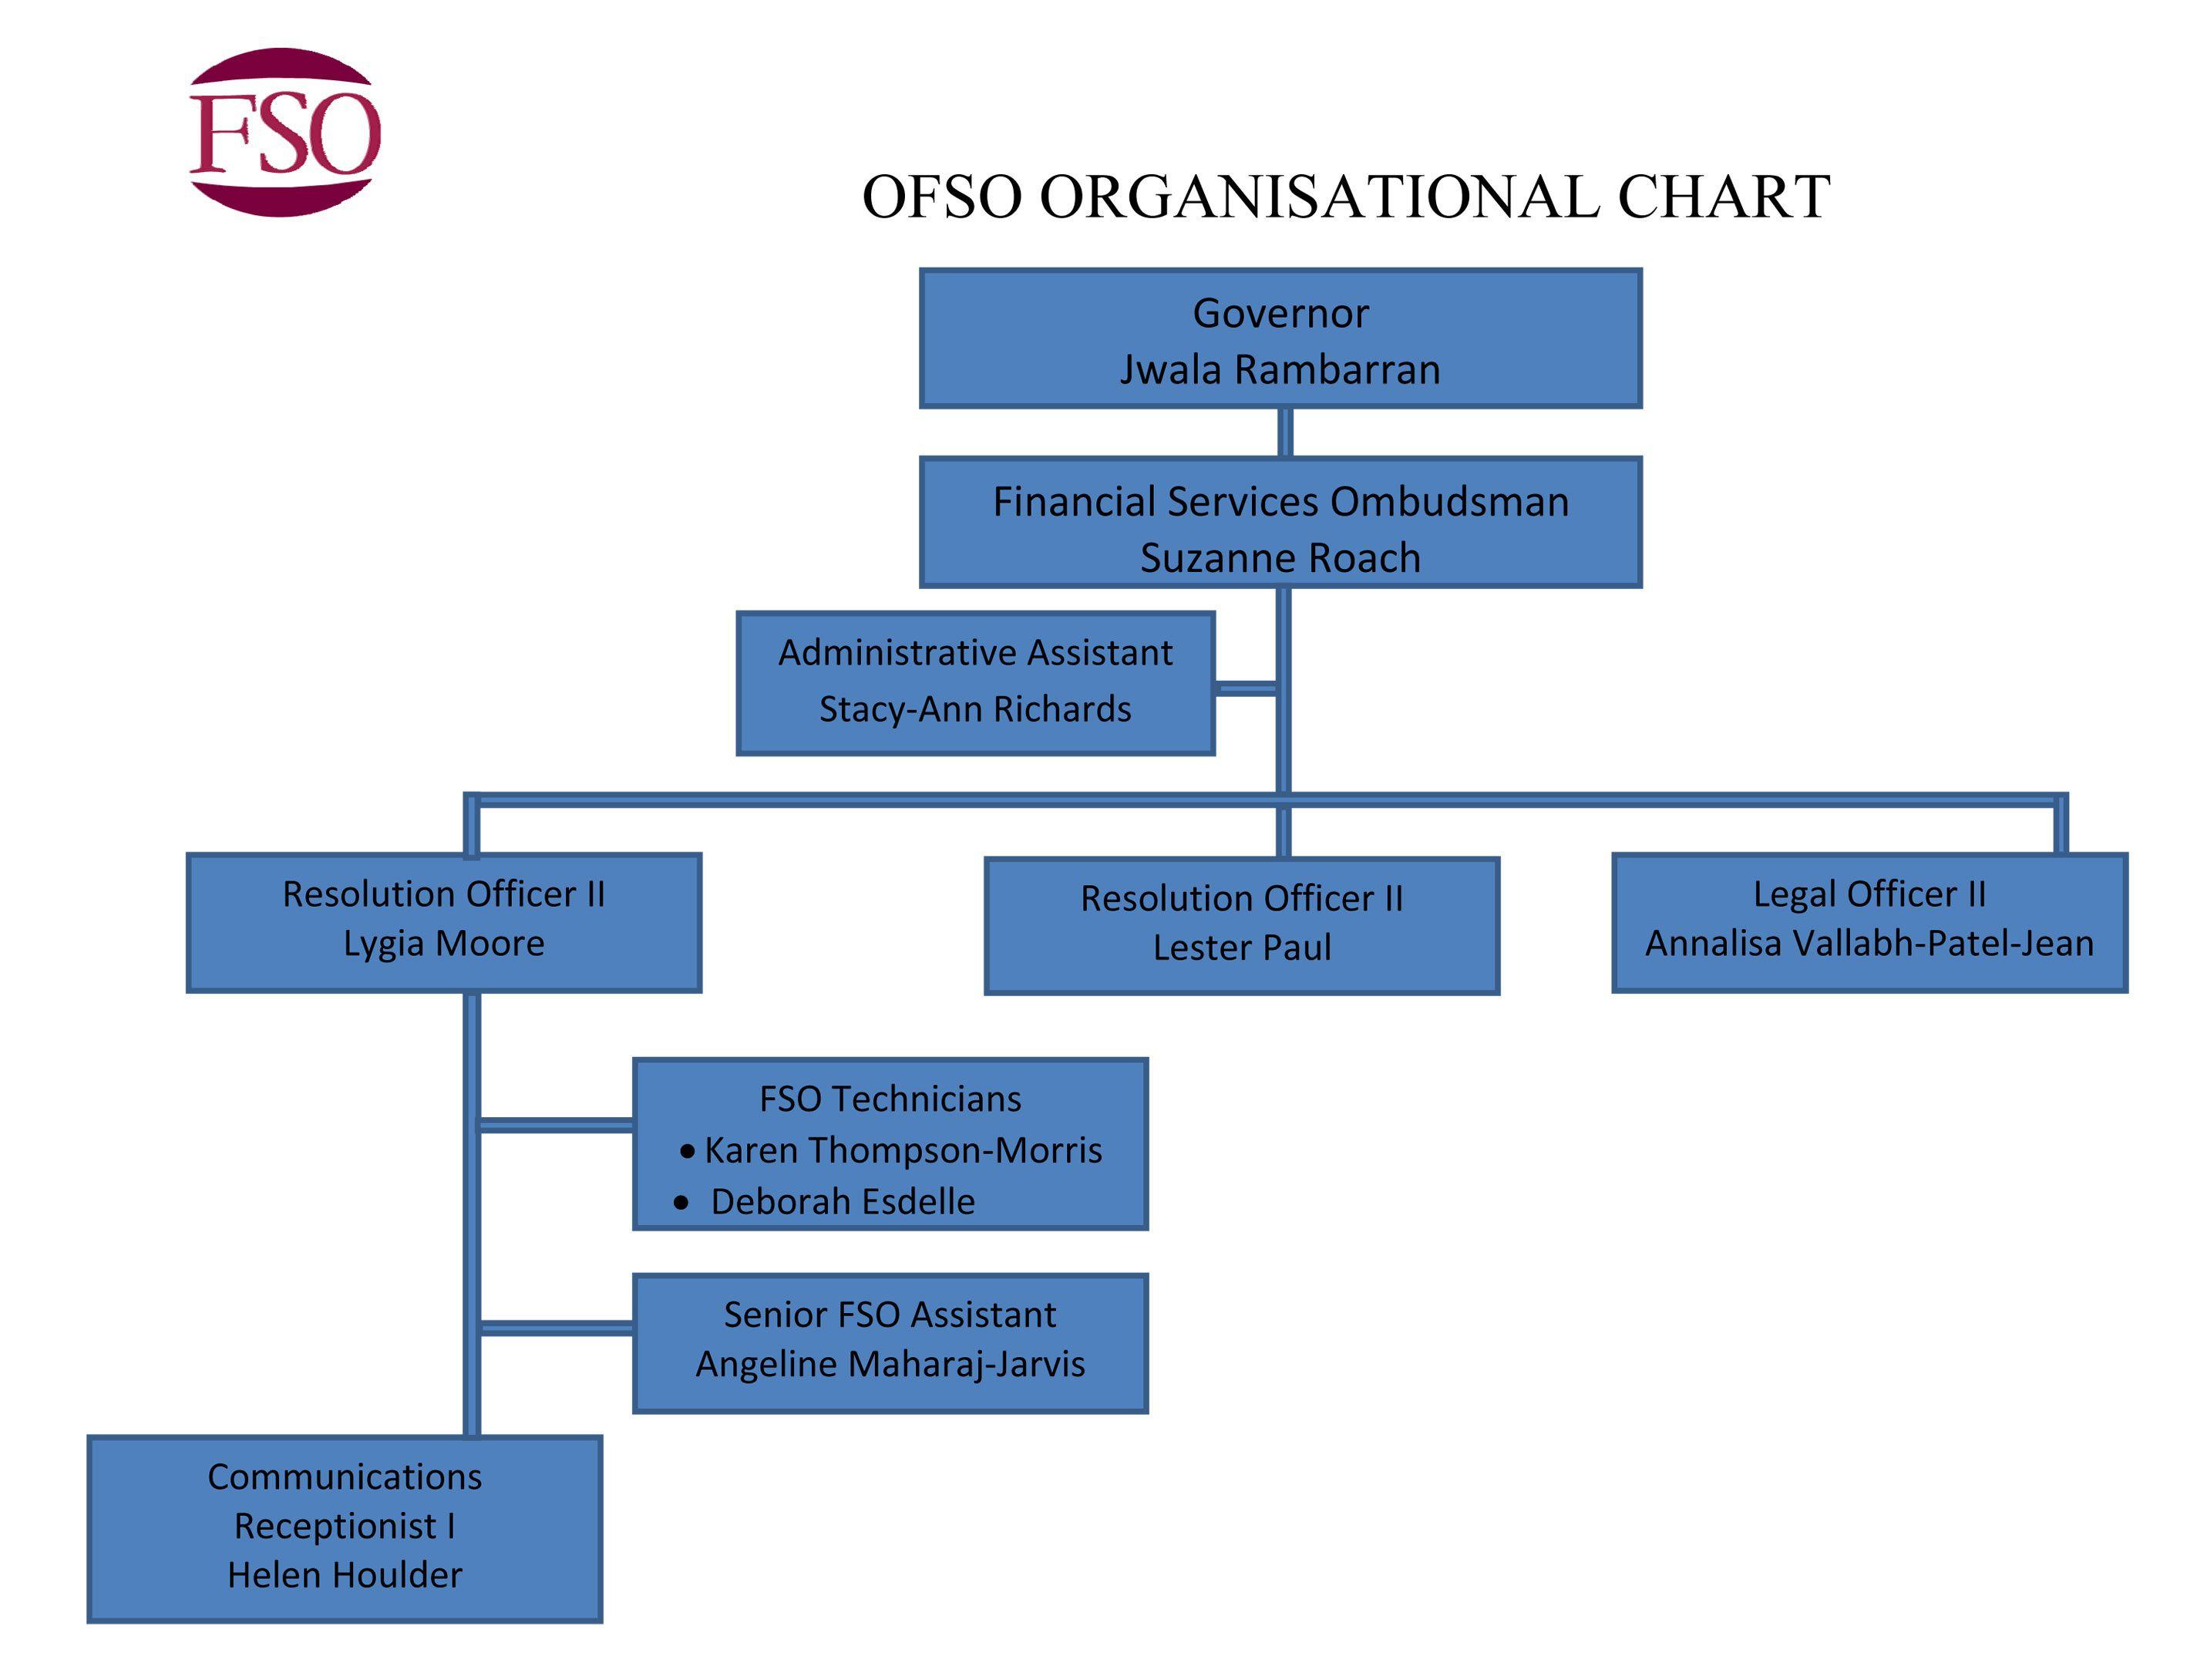 003 Unusual Organization Chart Template Word 2013 Idea  Organizational Free MicrosoftFull